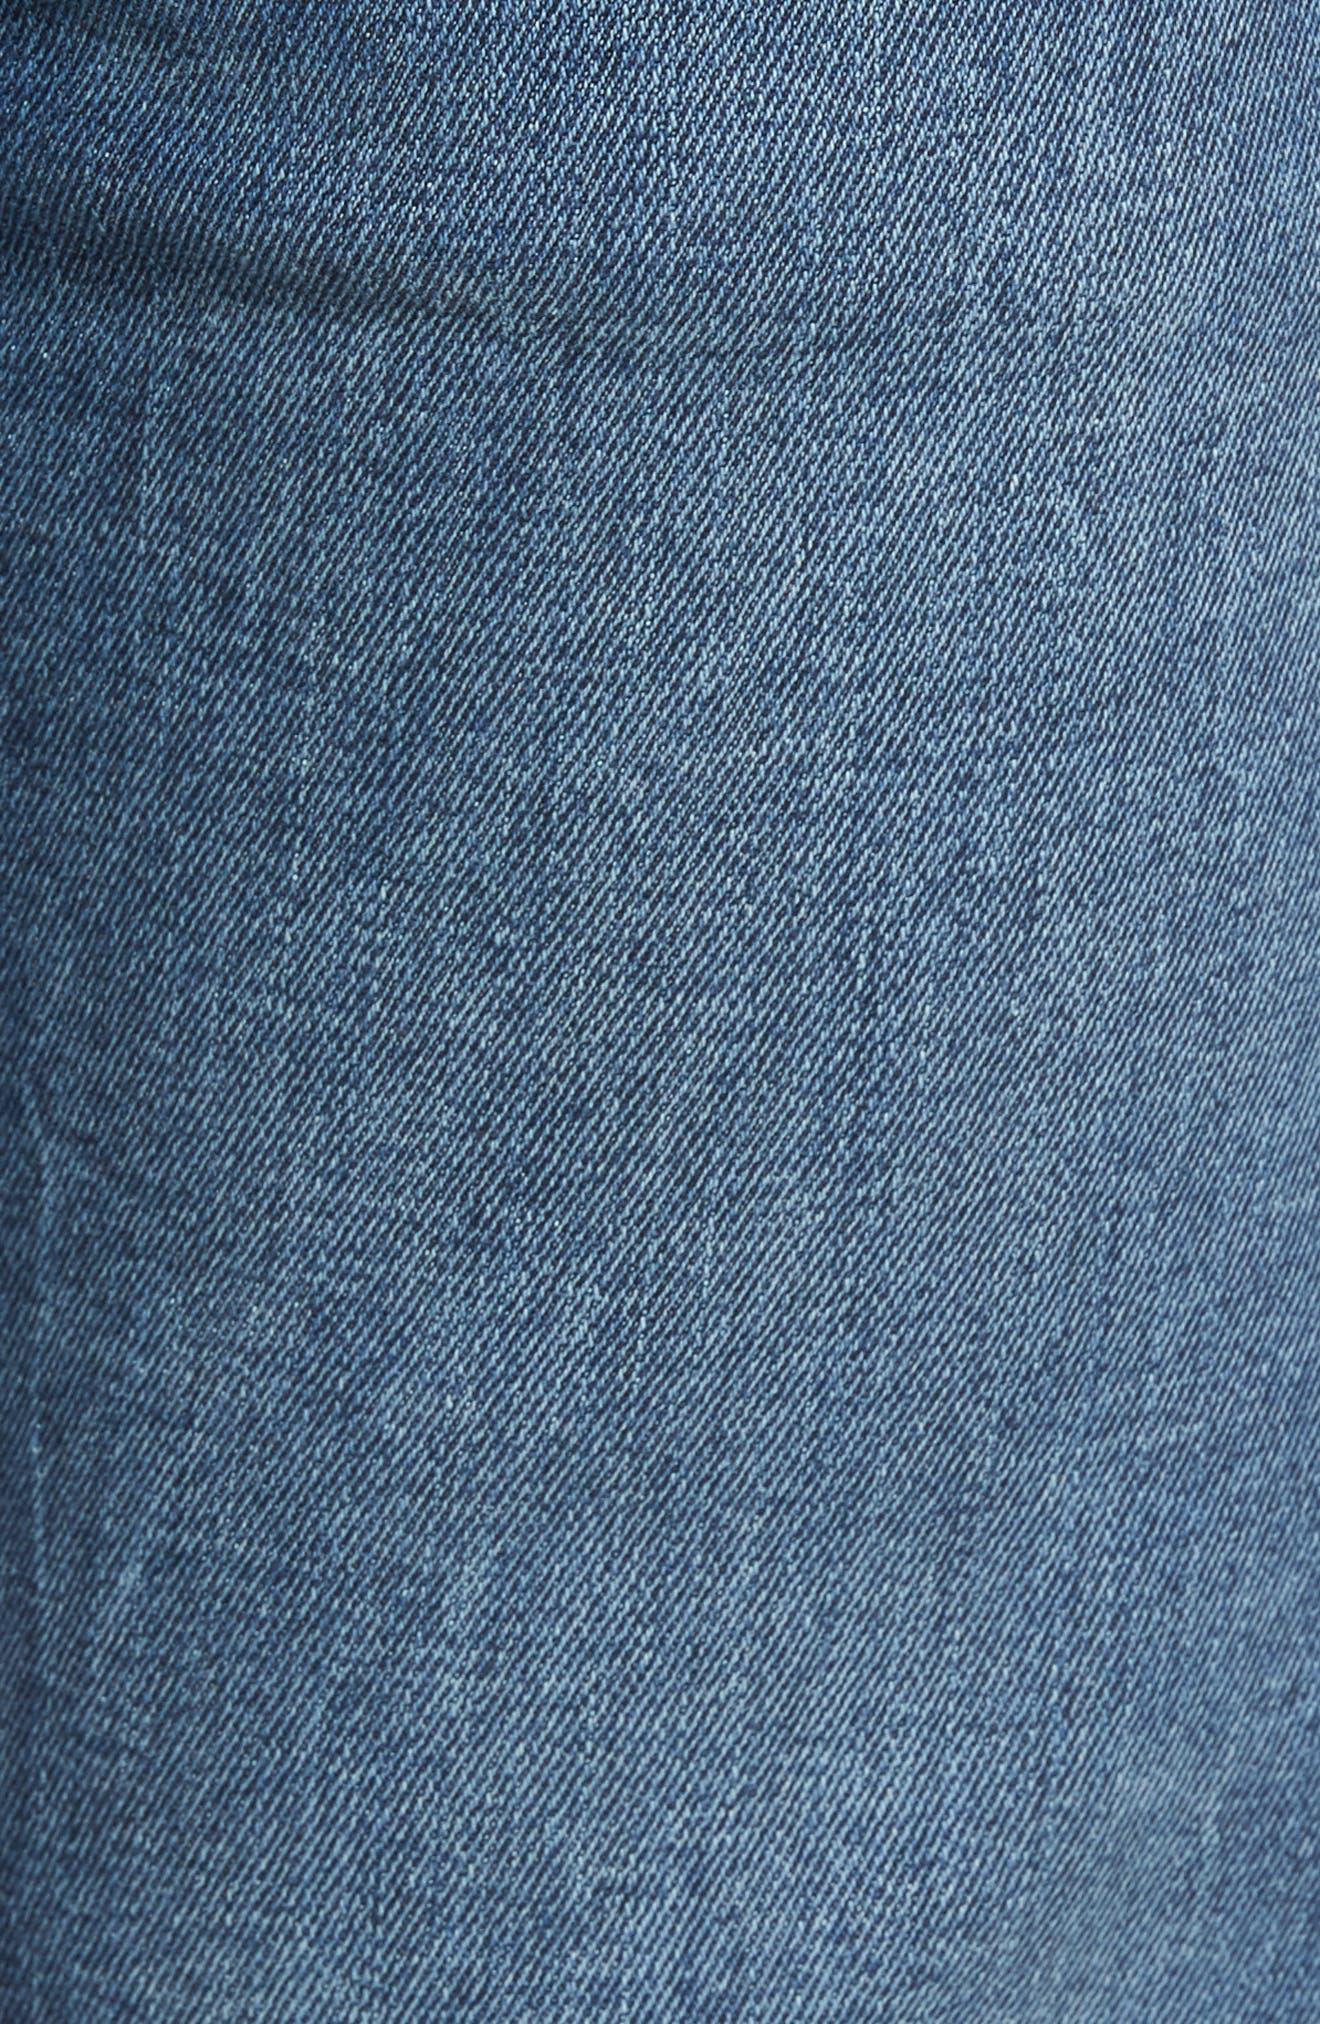 Alternate Image 5  - DL1961 Nick Slim Fit Jeans (Civil)